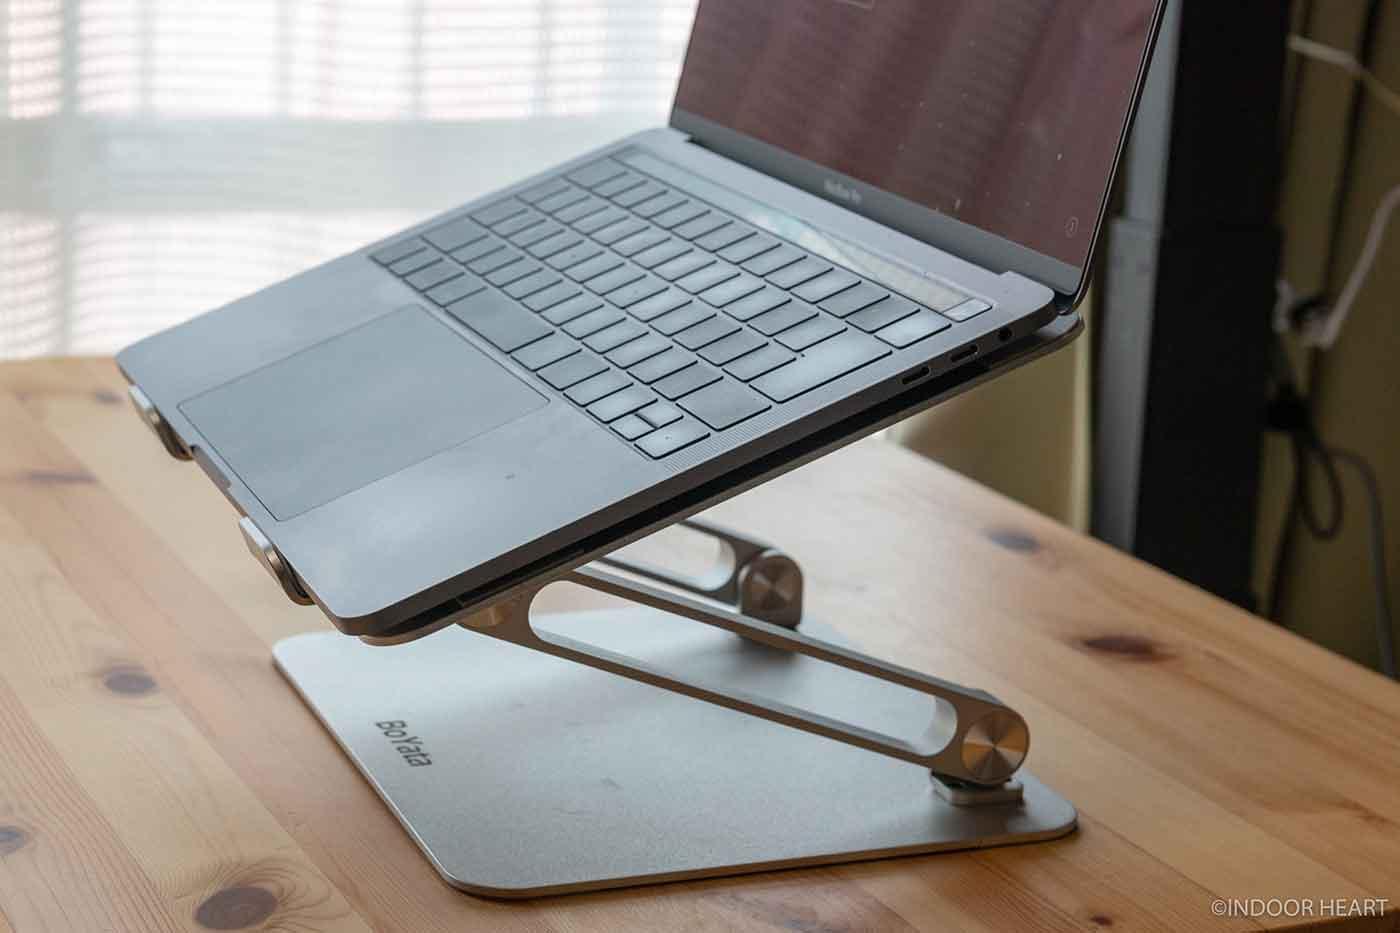 BoYotaノートPCスタンドとMacBook